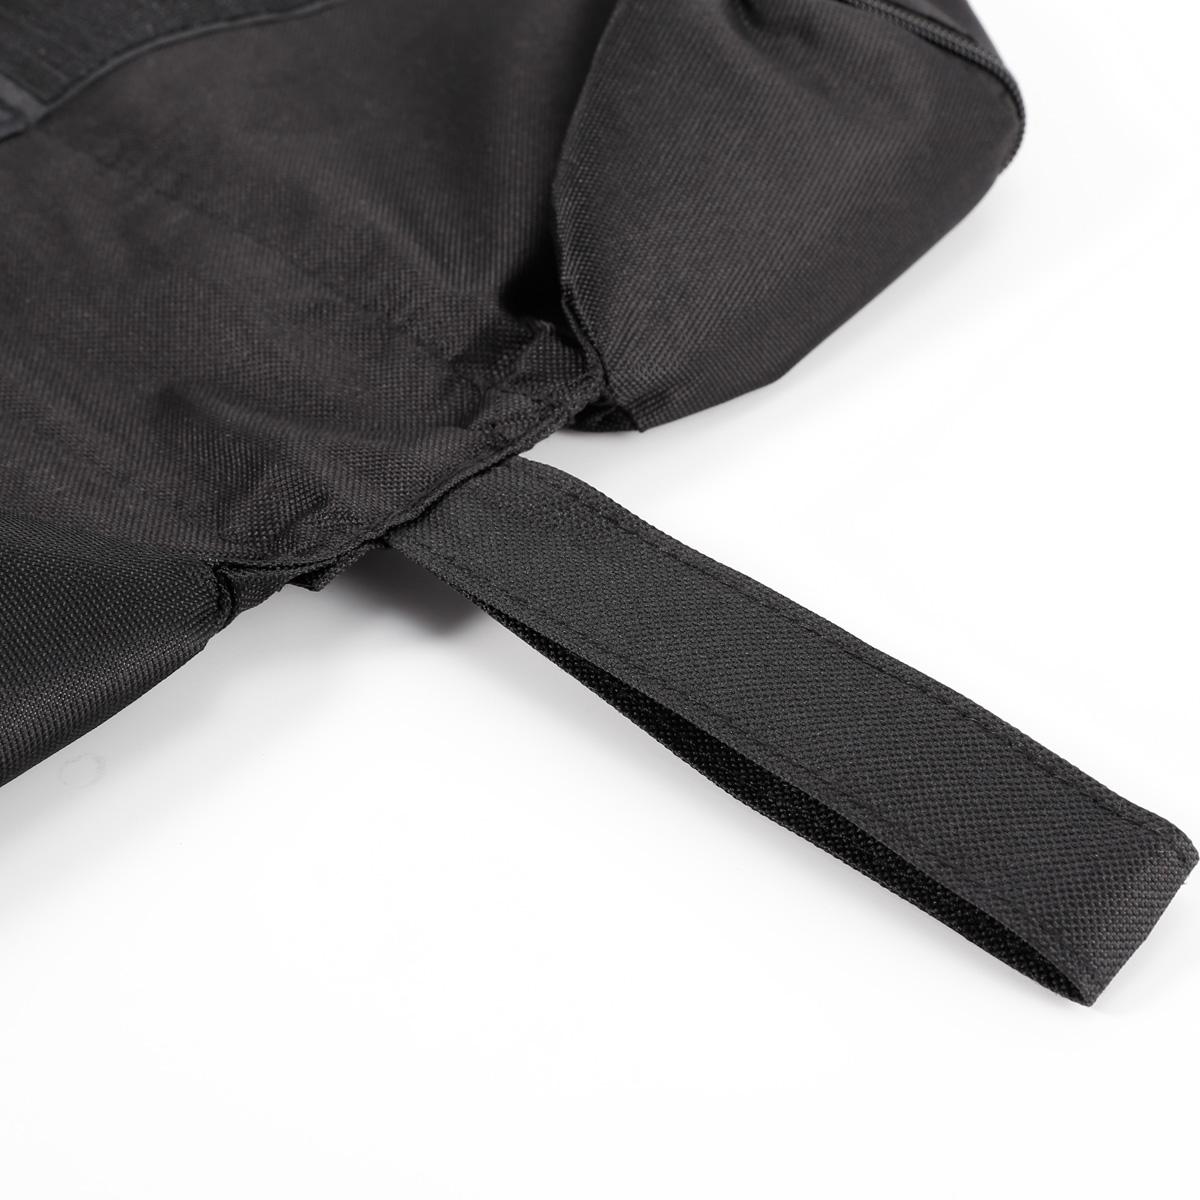 4x sac de sable poids ancrage pond rer pieds jambes belv d re gazebo papillon ebay. Black Bedroom Furniture Sets. Home Design Ideas